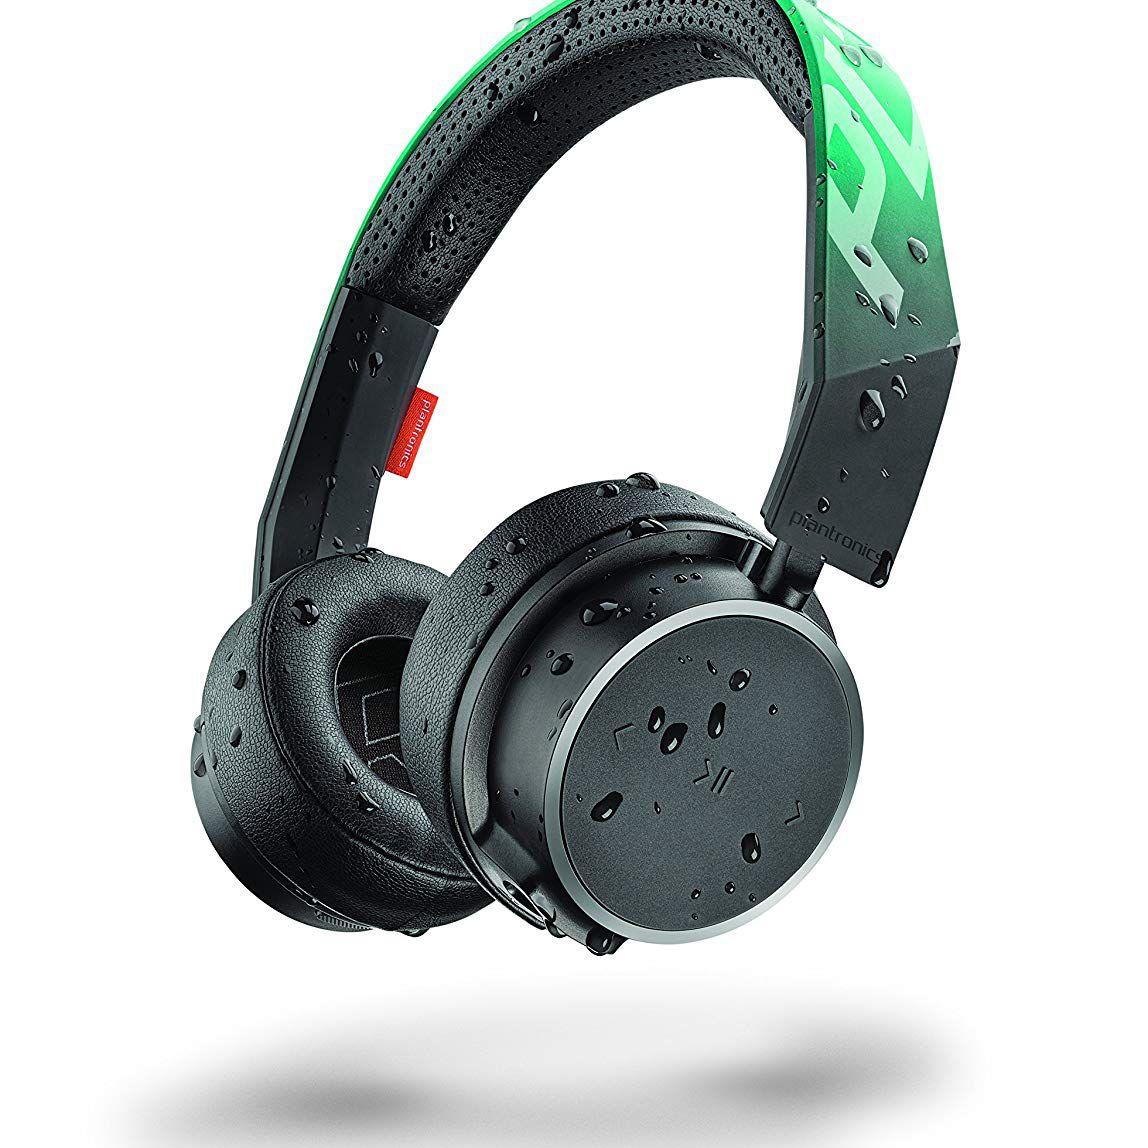 ba0fa0c2995 Best for Exercise: Plantronics BackBeat FIT 500 On-Ear Sport Headphones